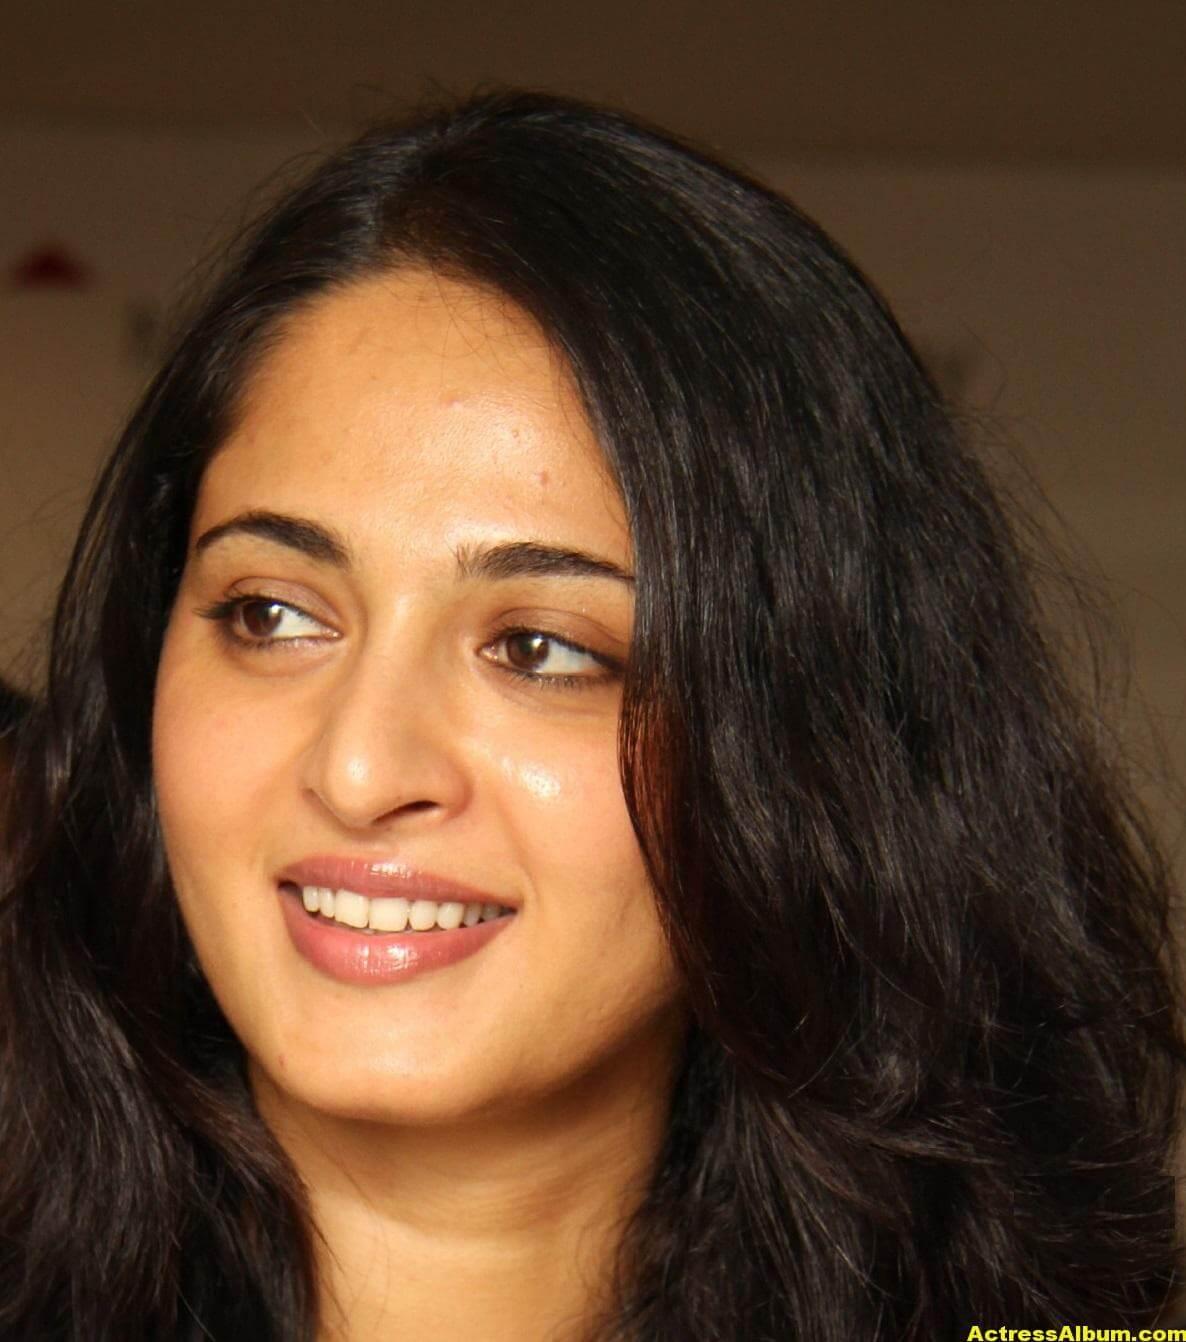 Anushka Shetty Beautiful Face Close Up Photos